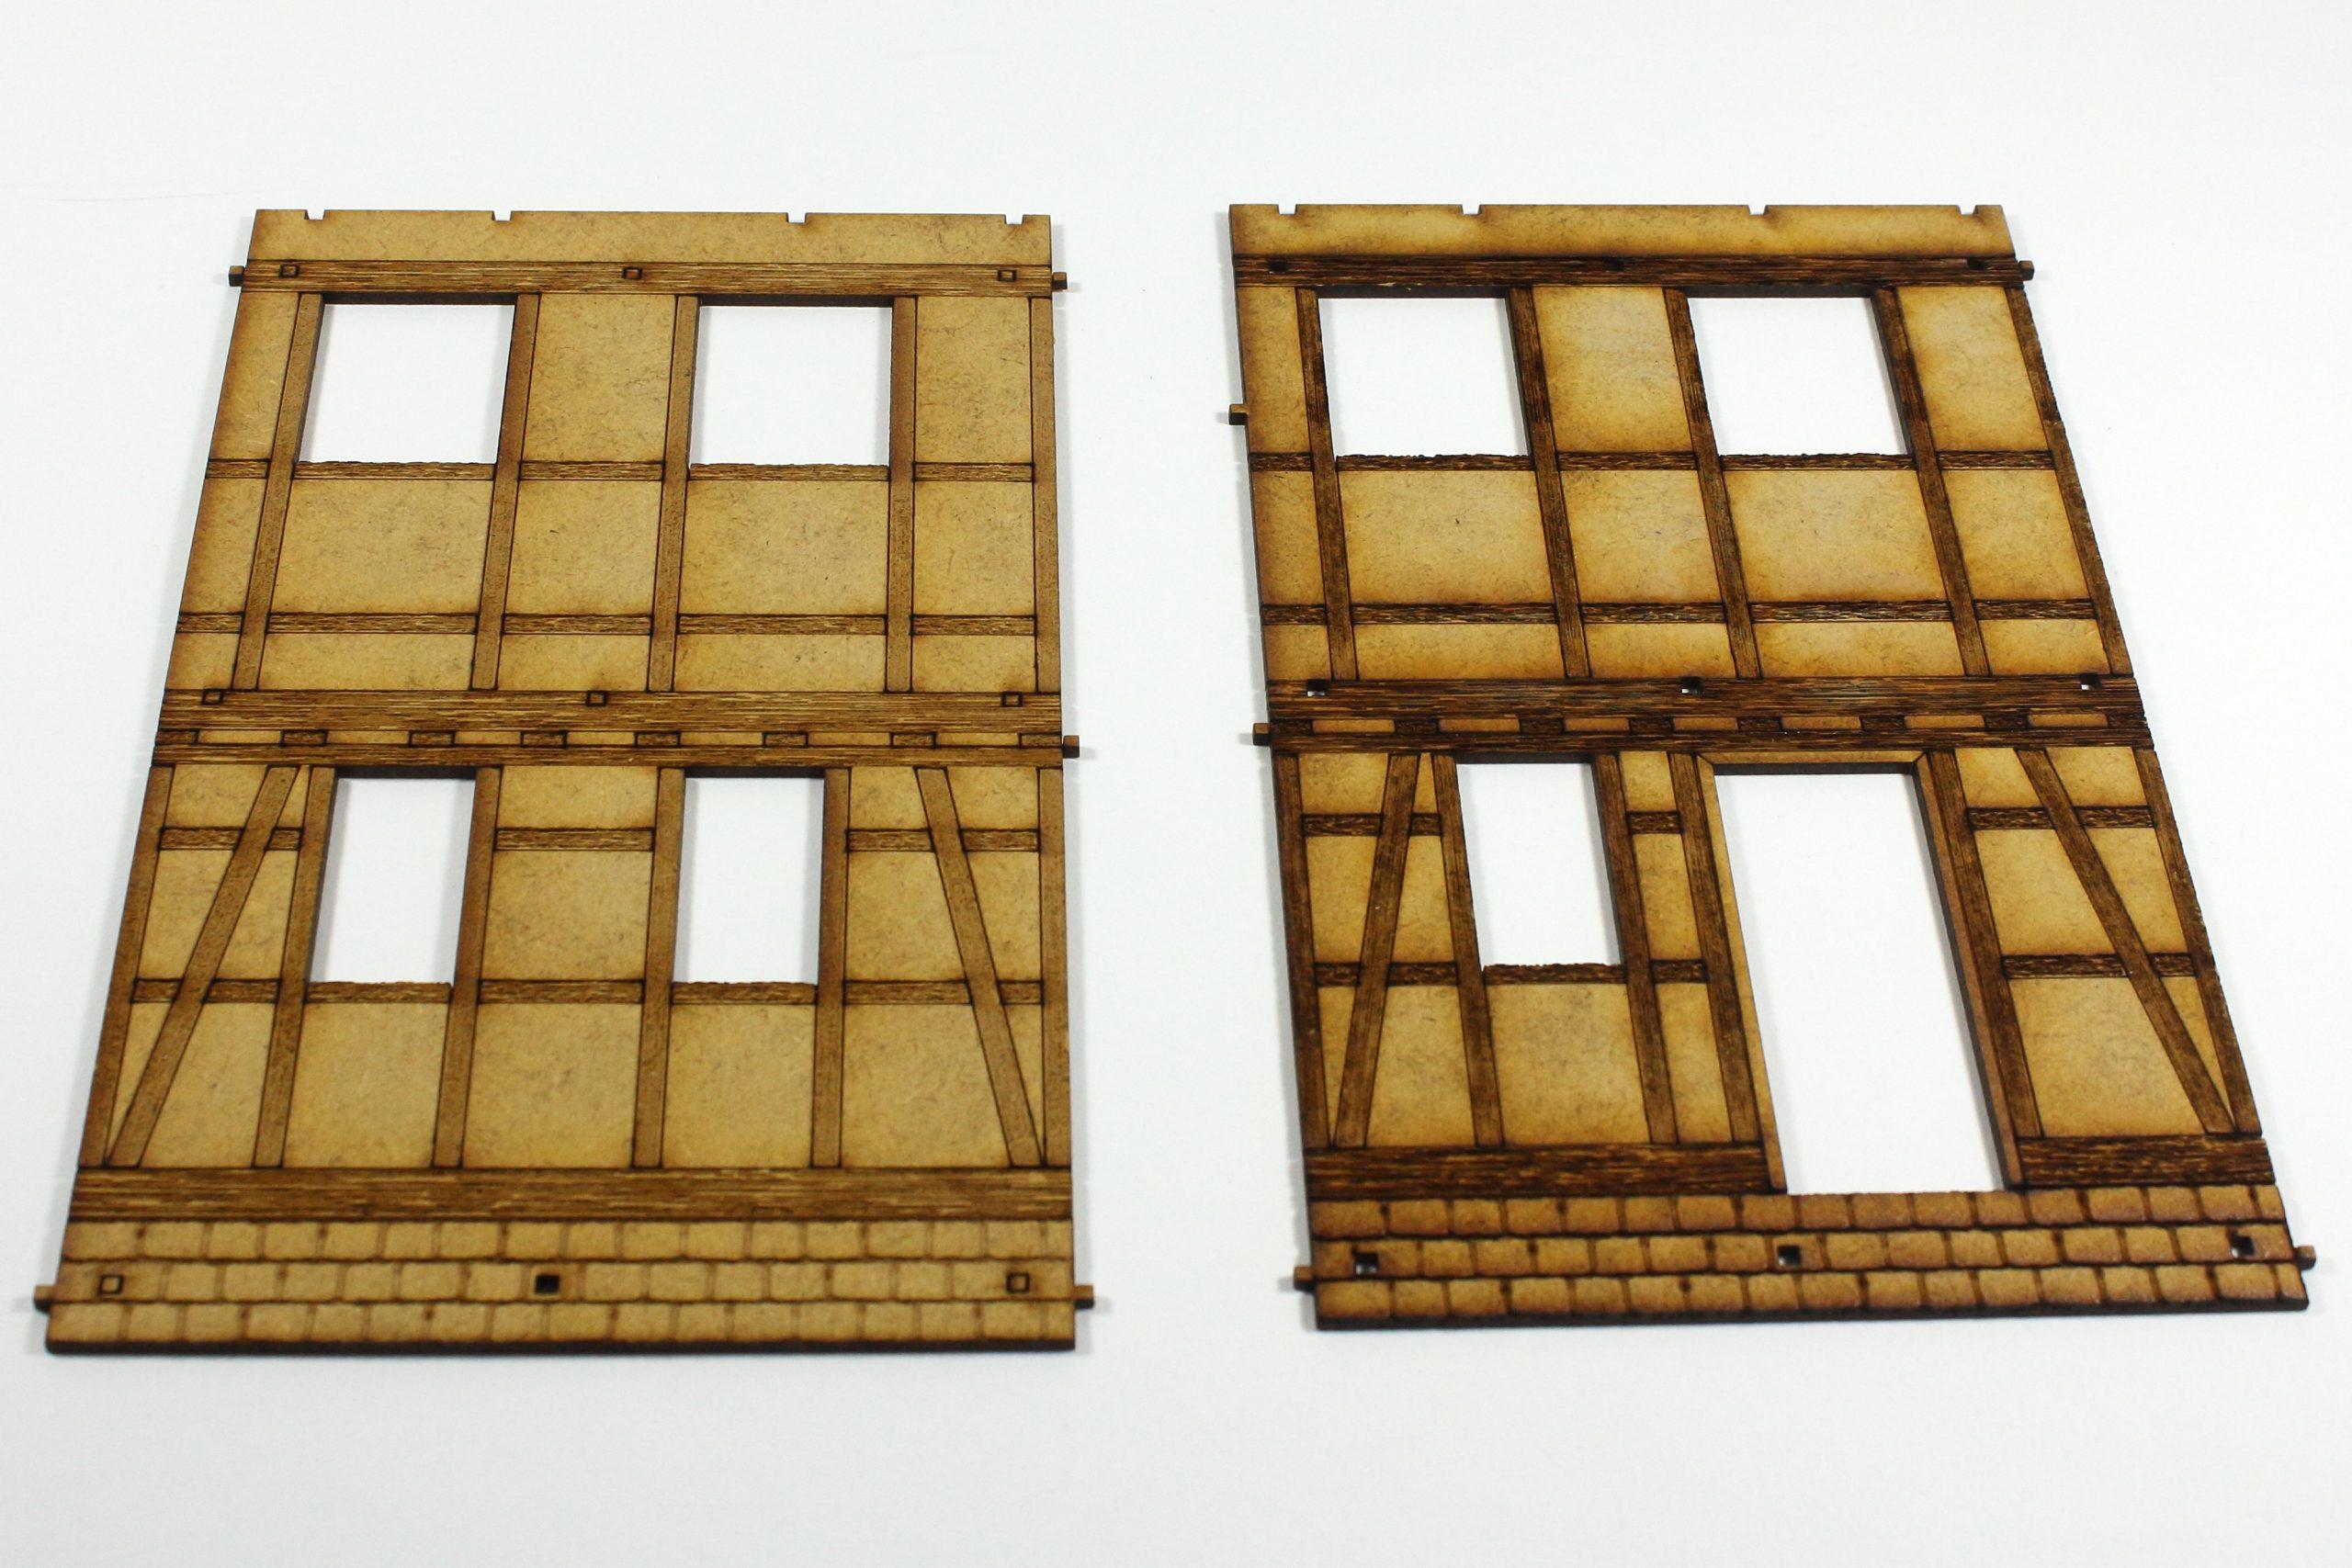 Bild-2-scaled Fachwerkhaus mit Holzschuppen - Lasercut Modellbaushop 1:35